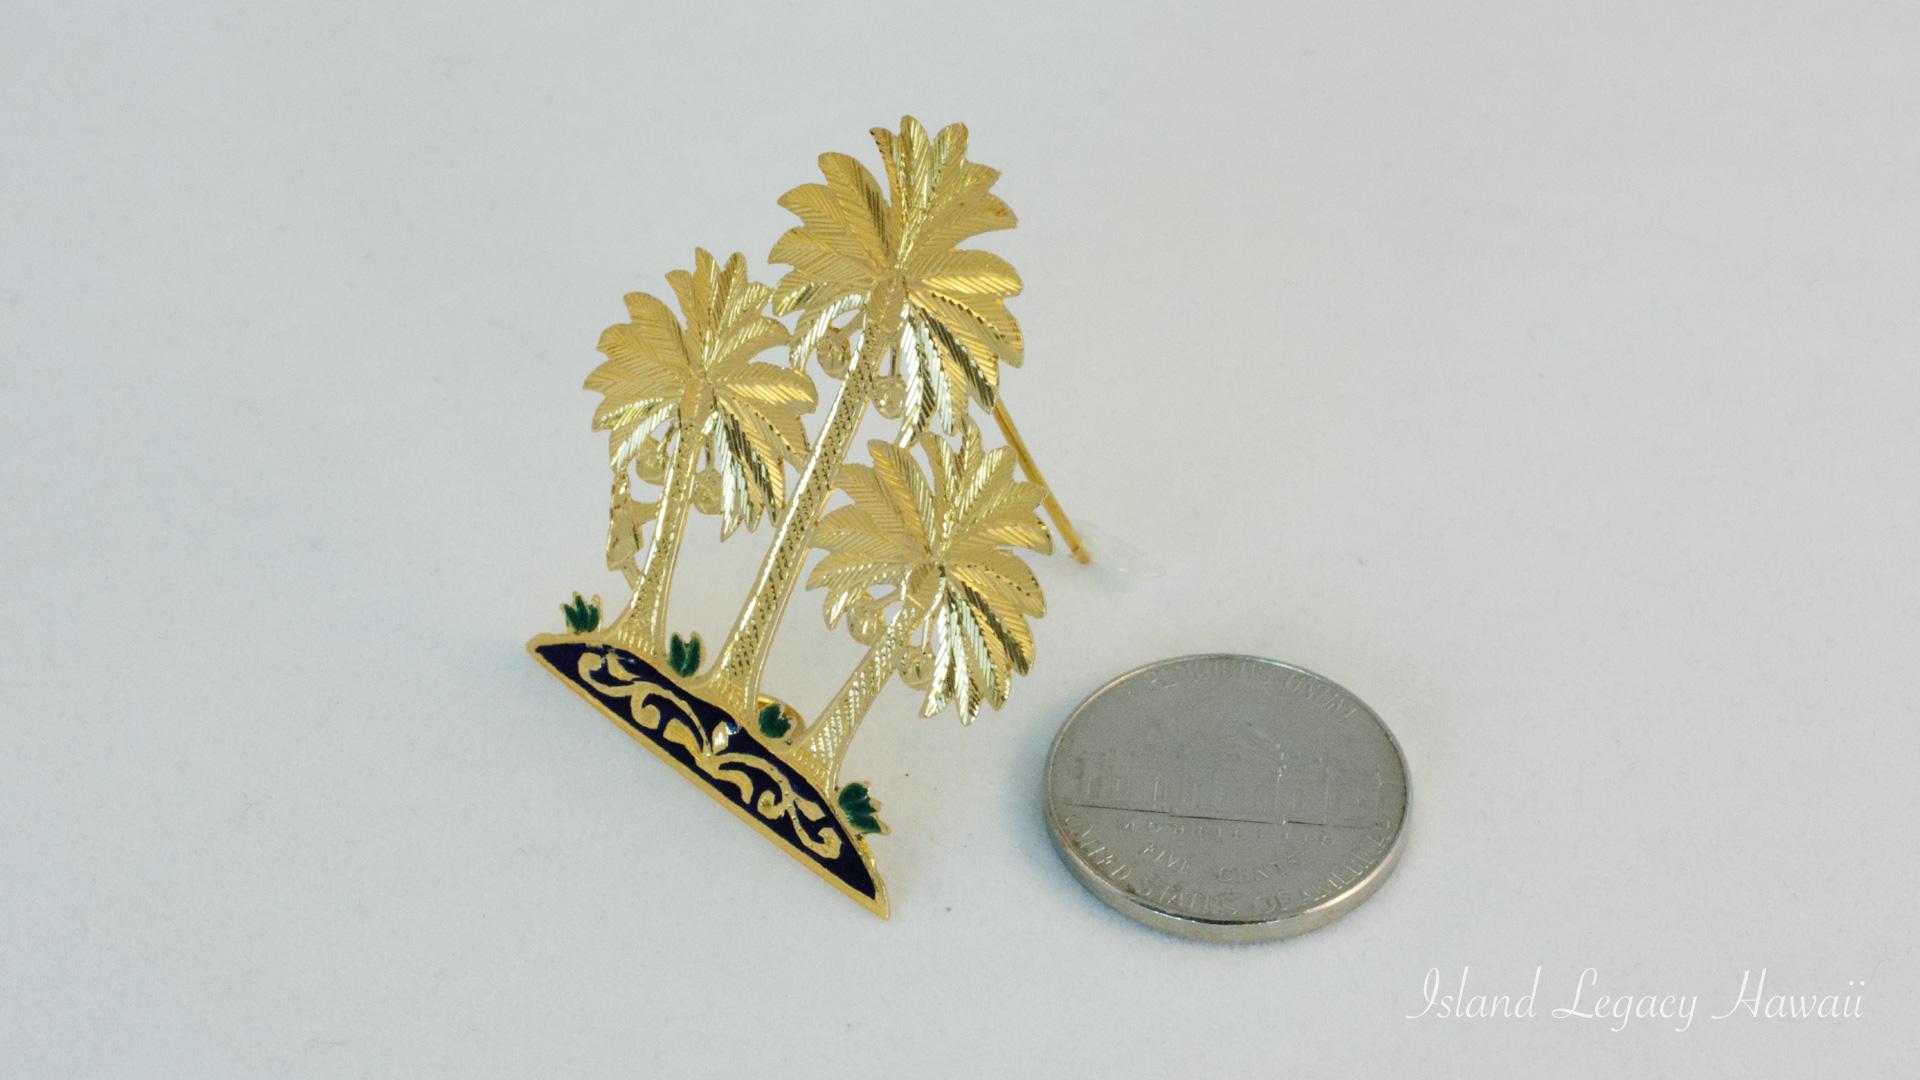 A handmade 18K pin/pendant #110-M012112M